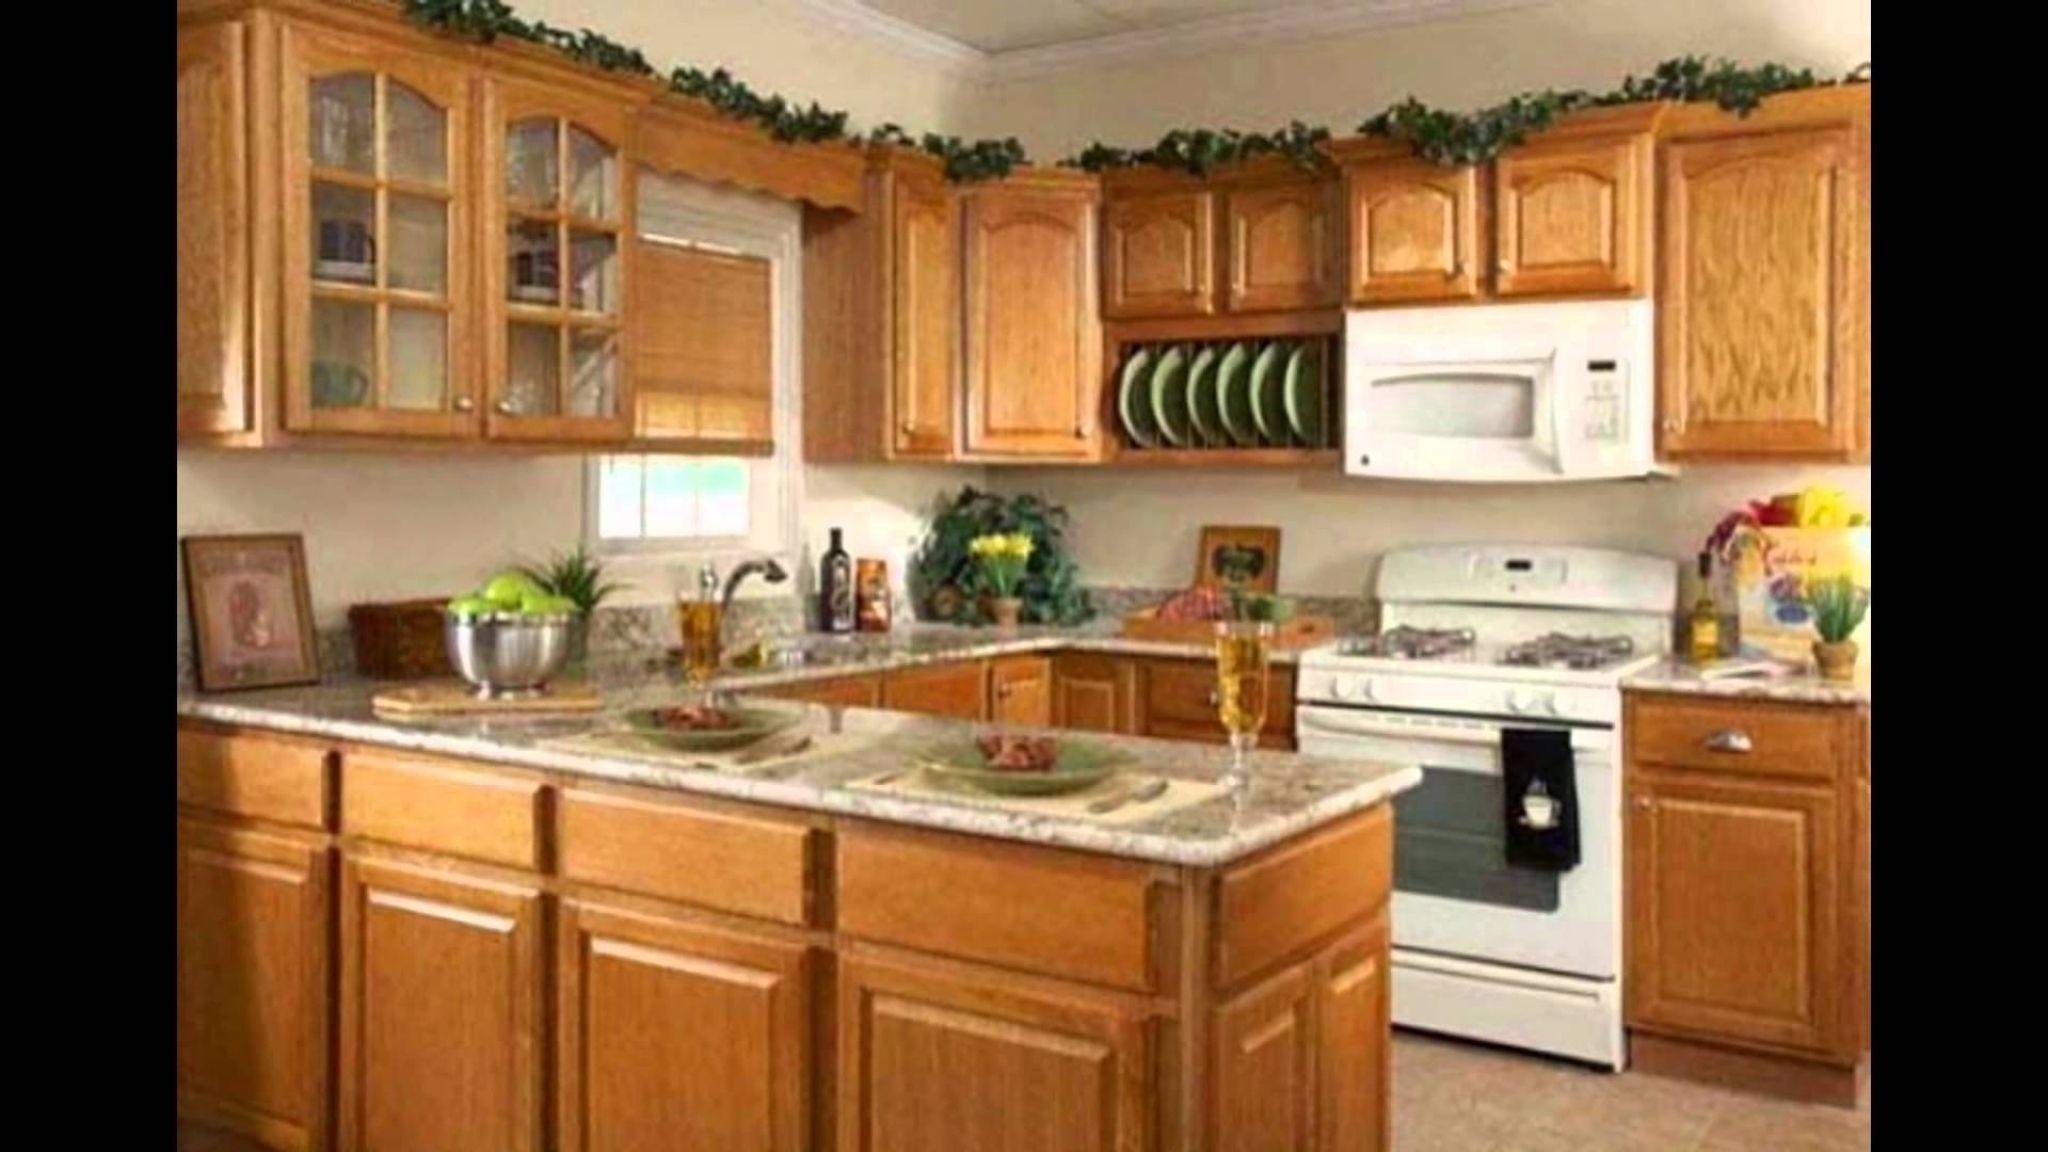 Honey Oak Kitchen Cabinets  Rustic Kitchen Decorating Ideas Check Pleasing Kerala Home Kitchen Designs Review